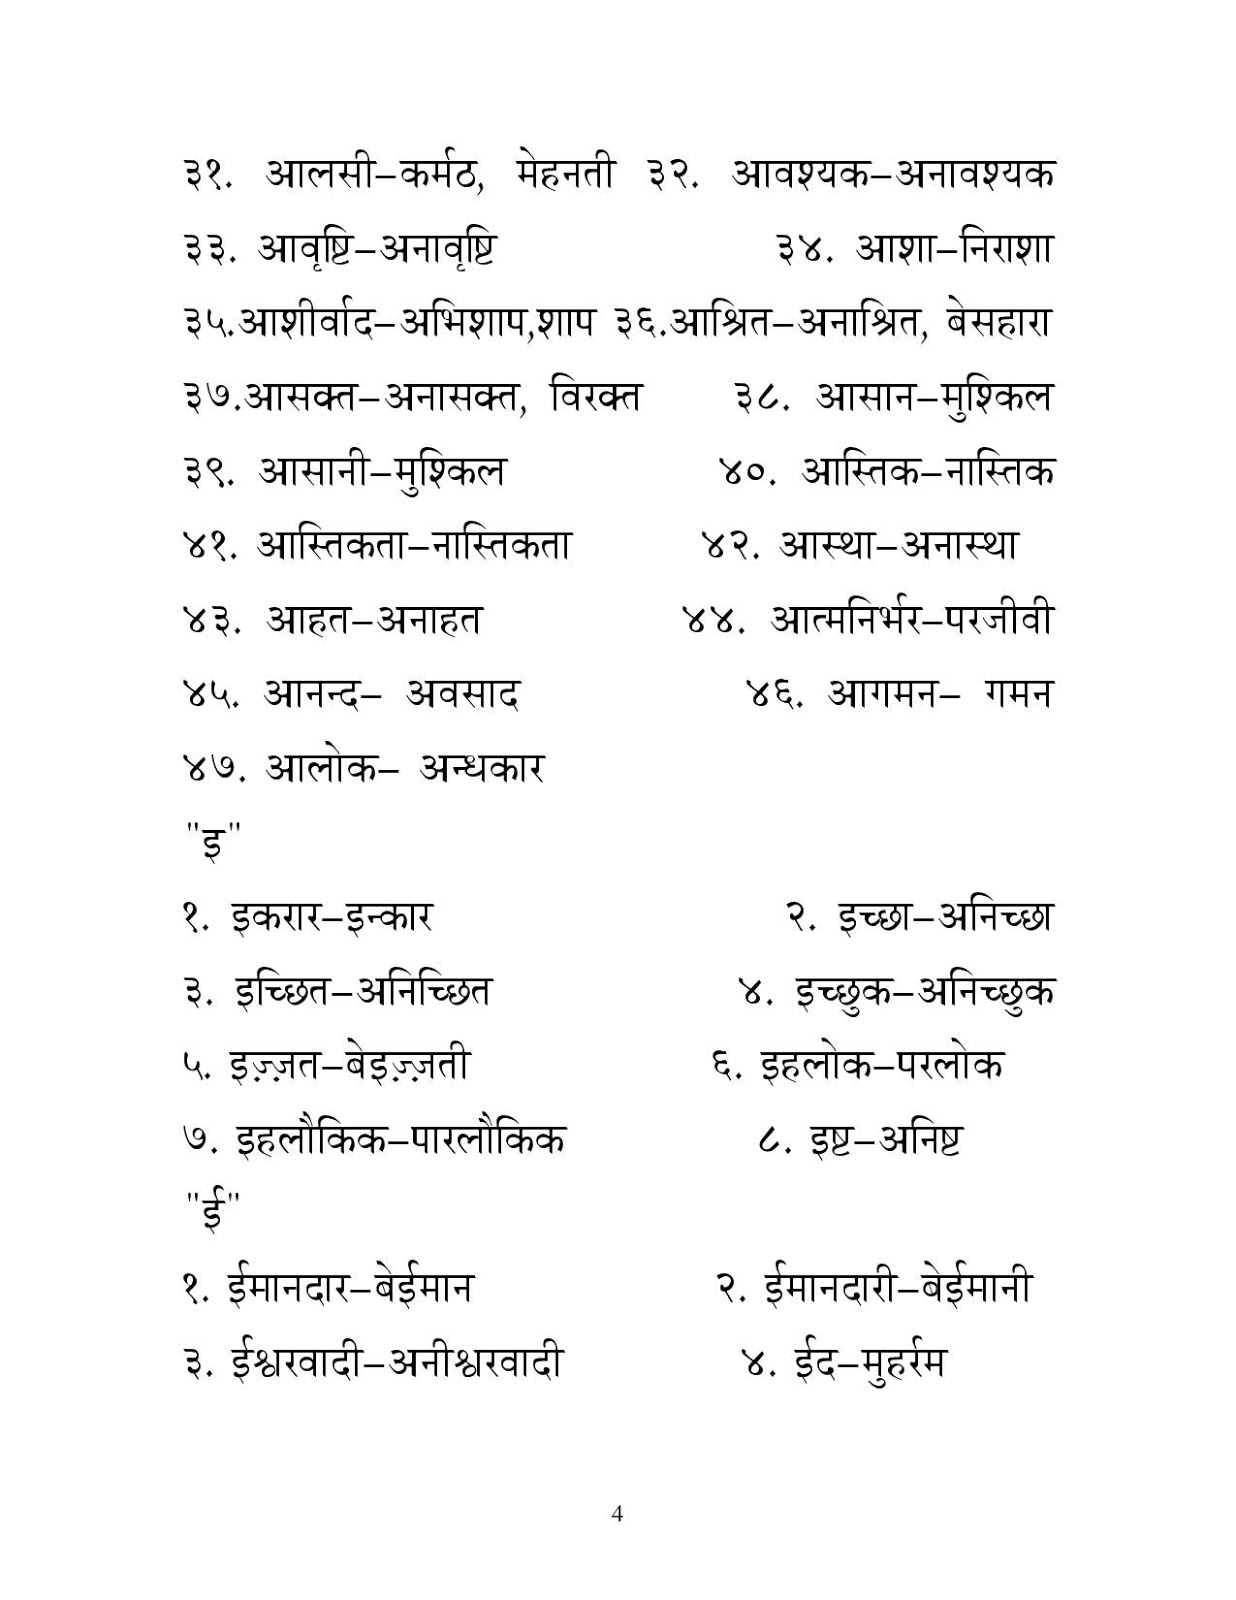 hight resolution of Free Worksheet For Icse Class 6 hindi grammar worksheets for class 6 icse  kendriya vidyalaya